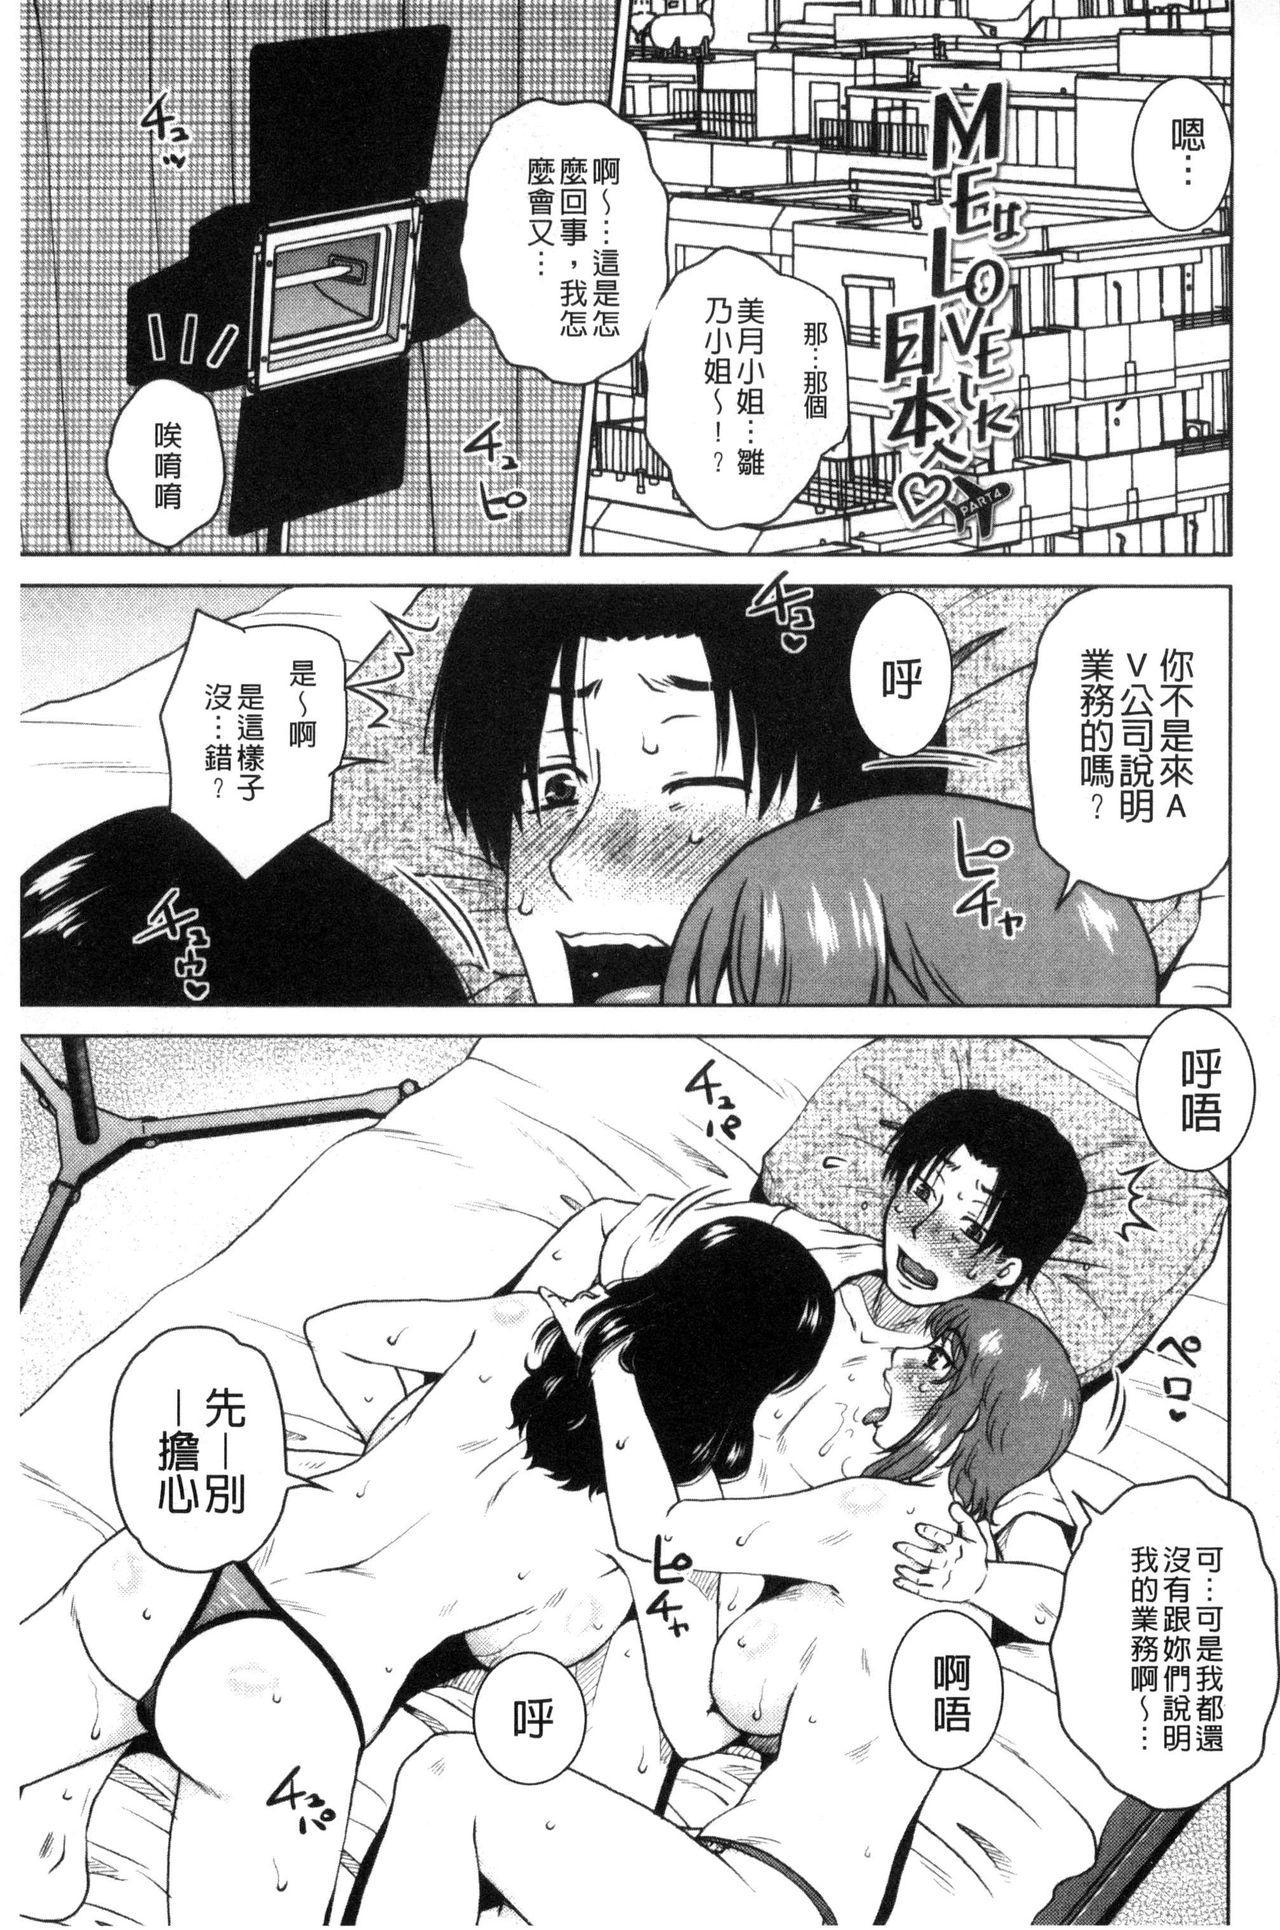 [Kurumiya Mashimin] Uchi no Shachou no Hamedere Inkatsu - Our President is HAME-DERE in Licentious sex life. [Chinese] 67